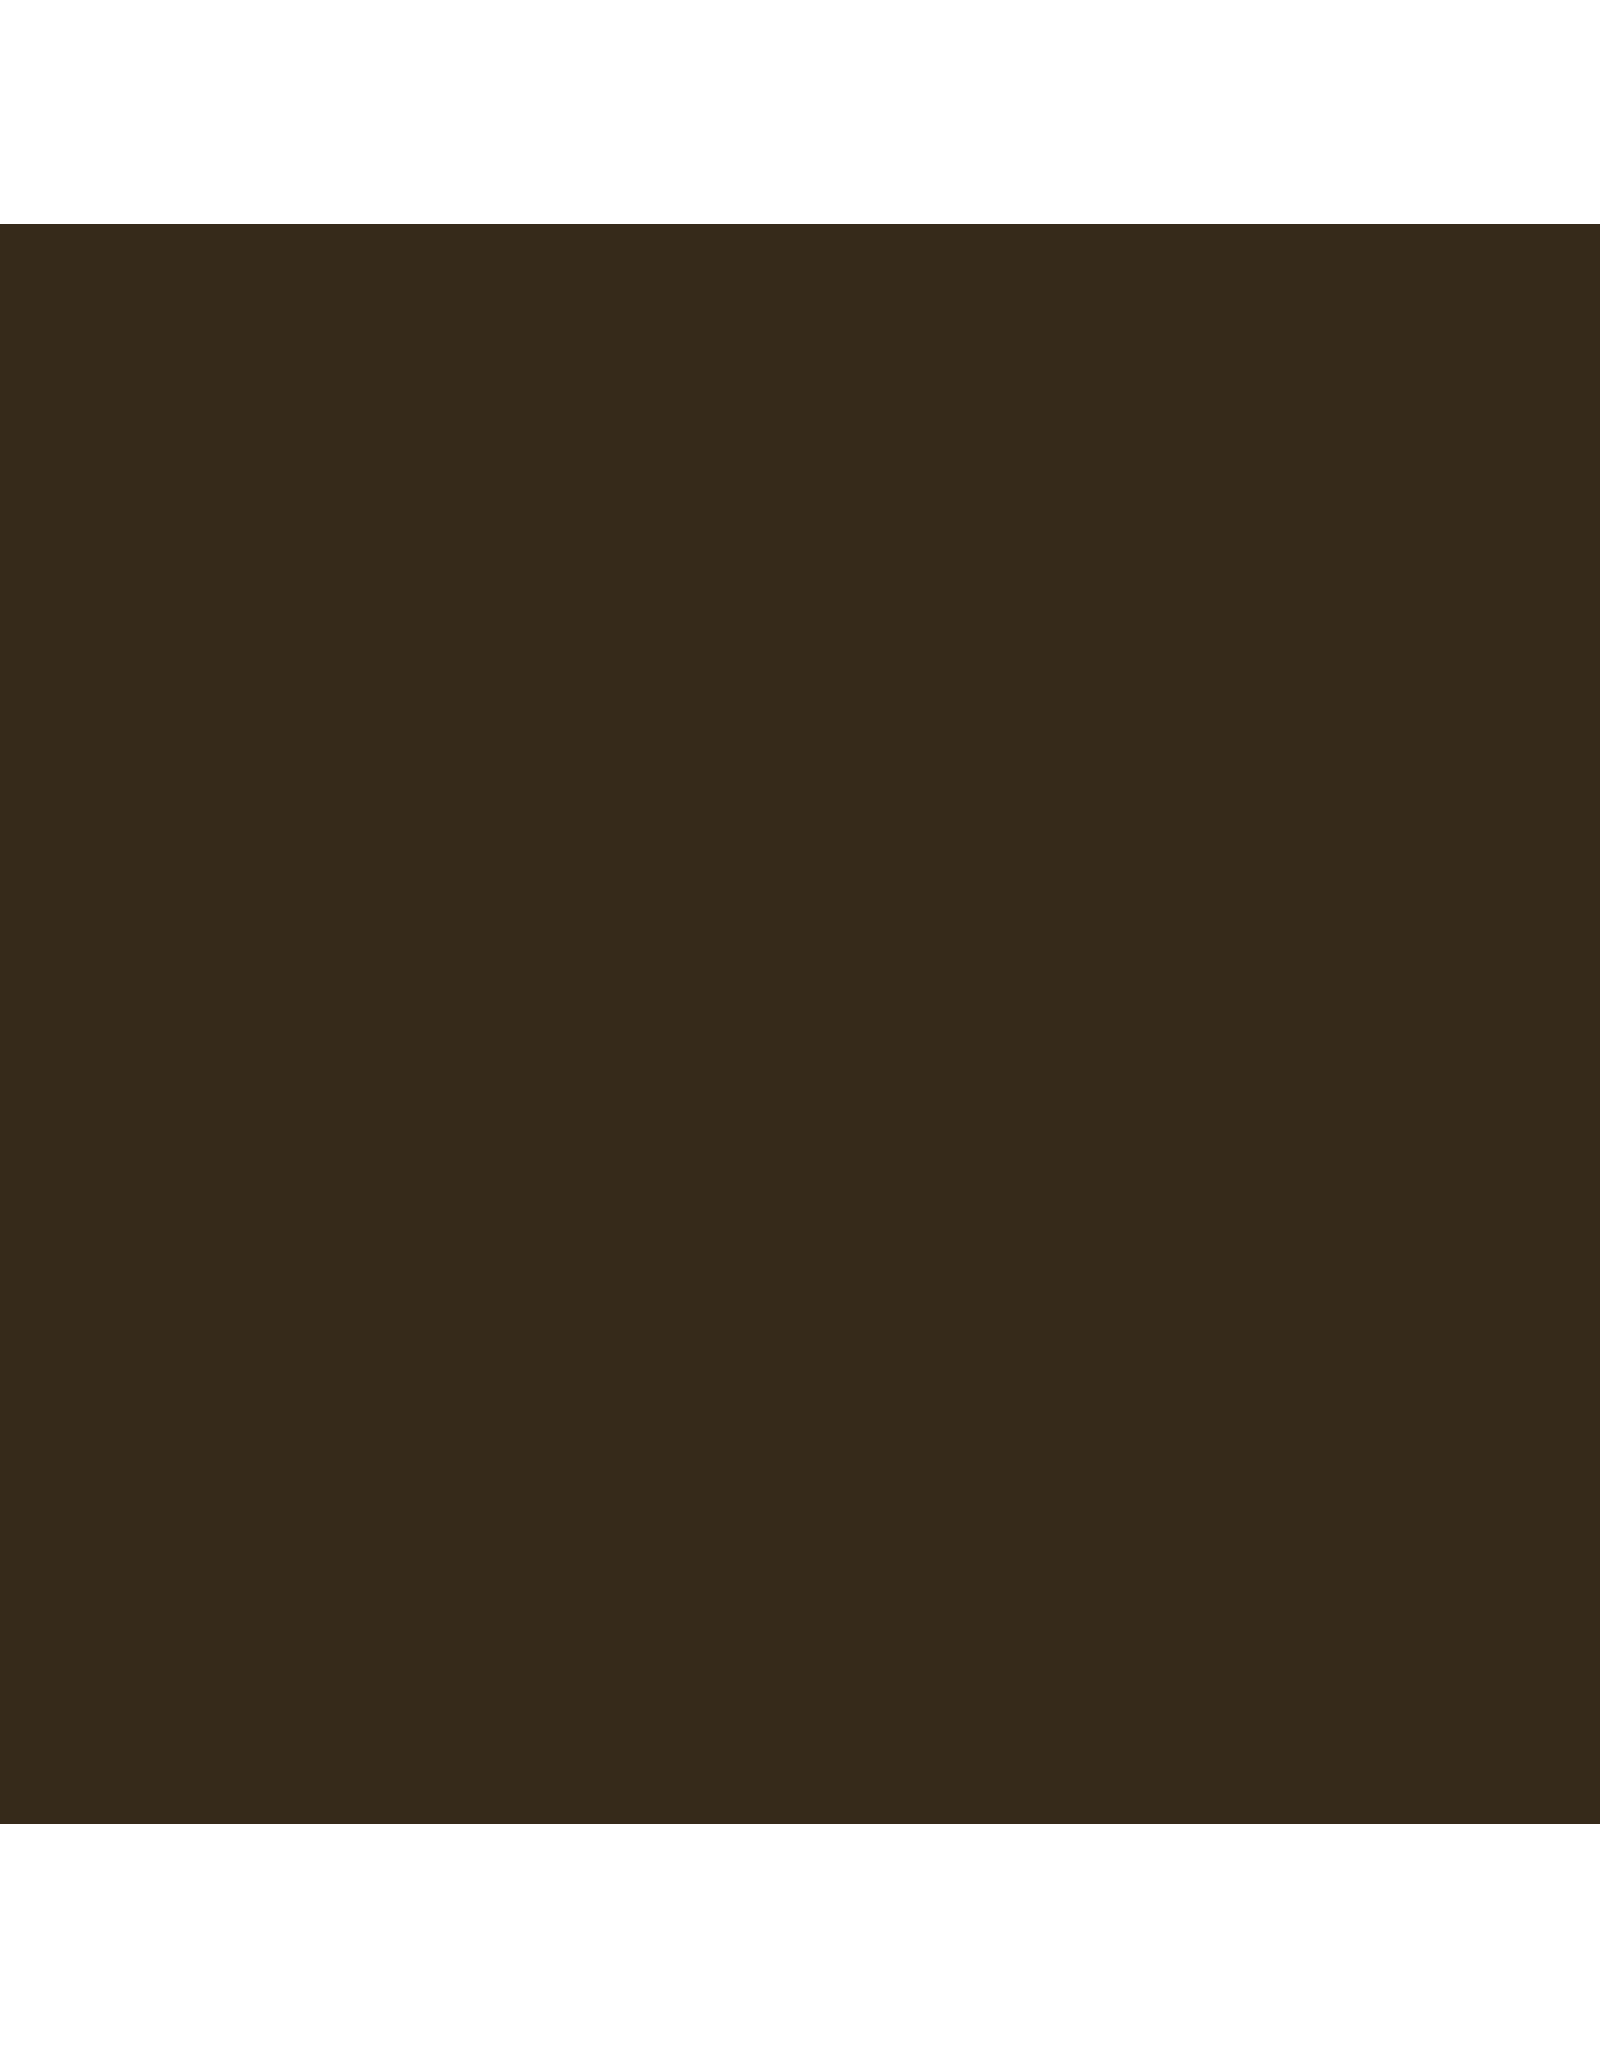 Bazzill Bazzill Card Shoppe 8.5x11 - Peanut Fudge